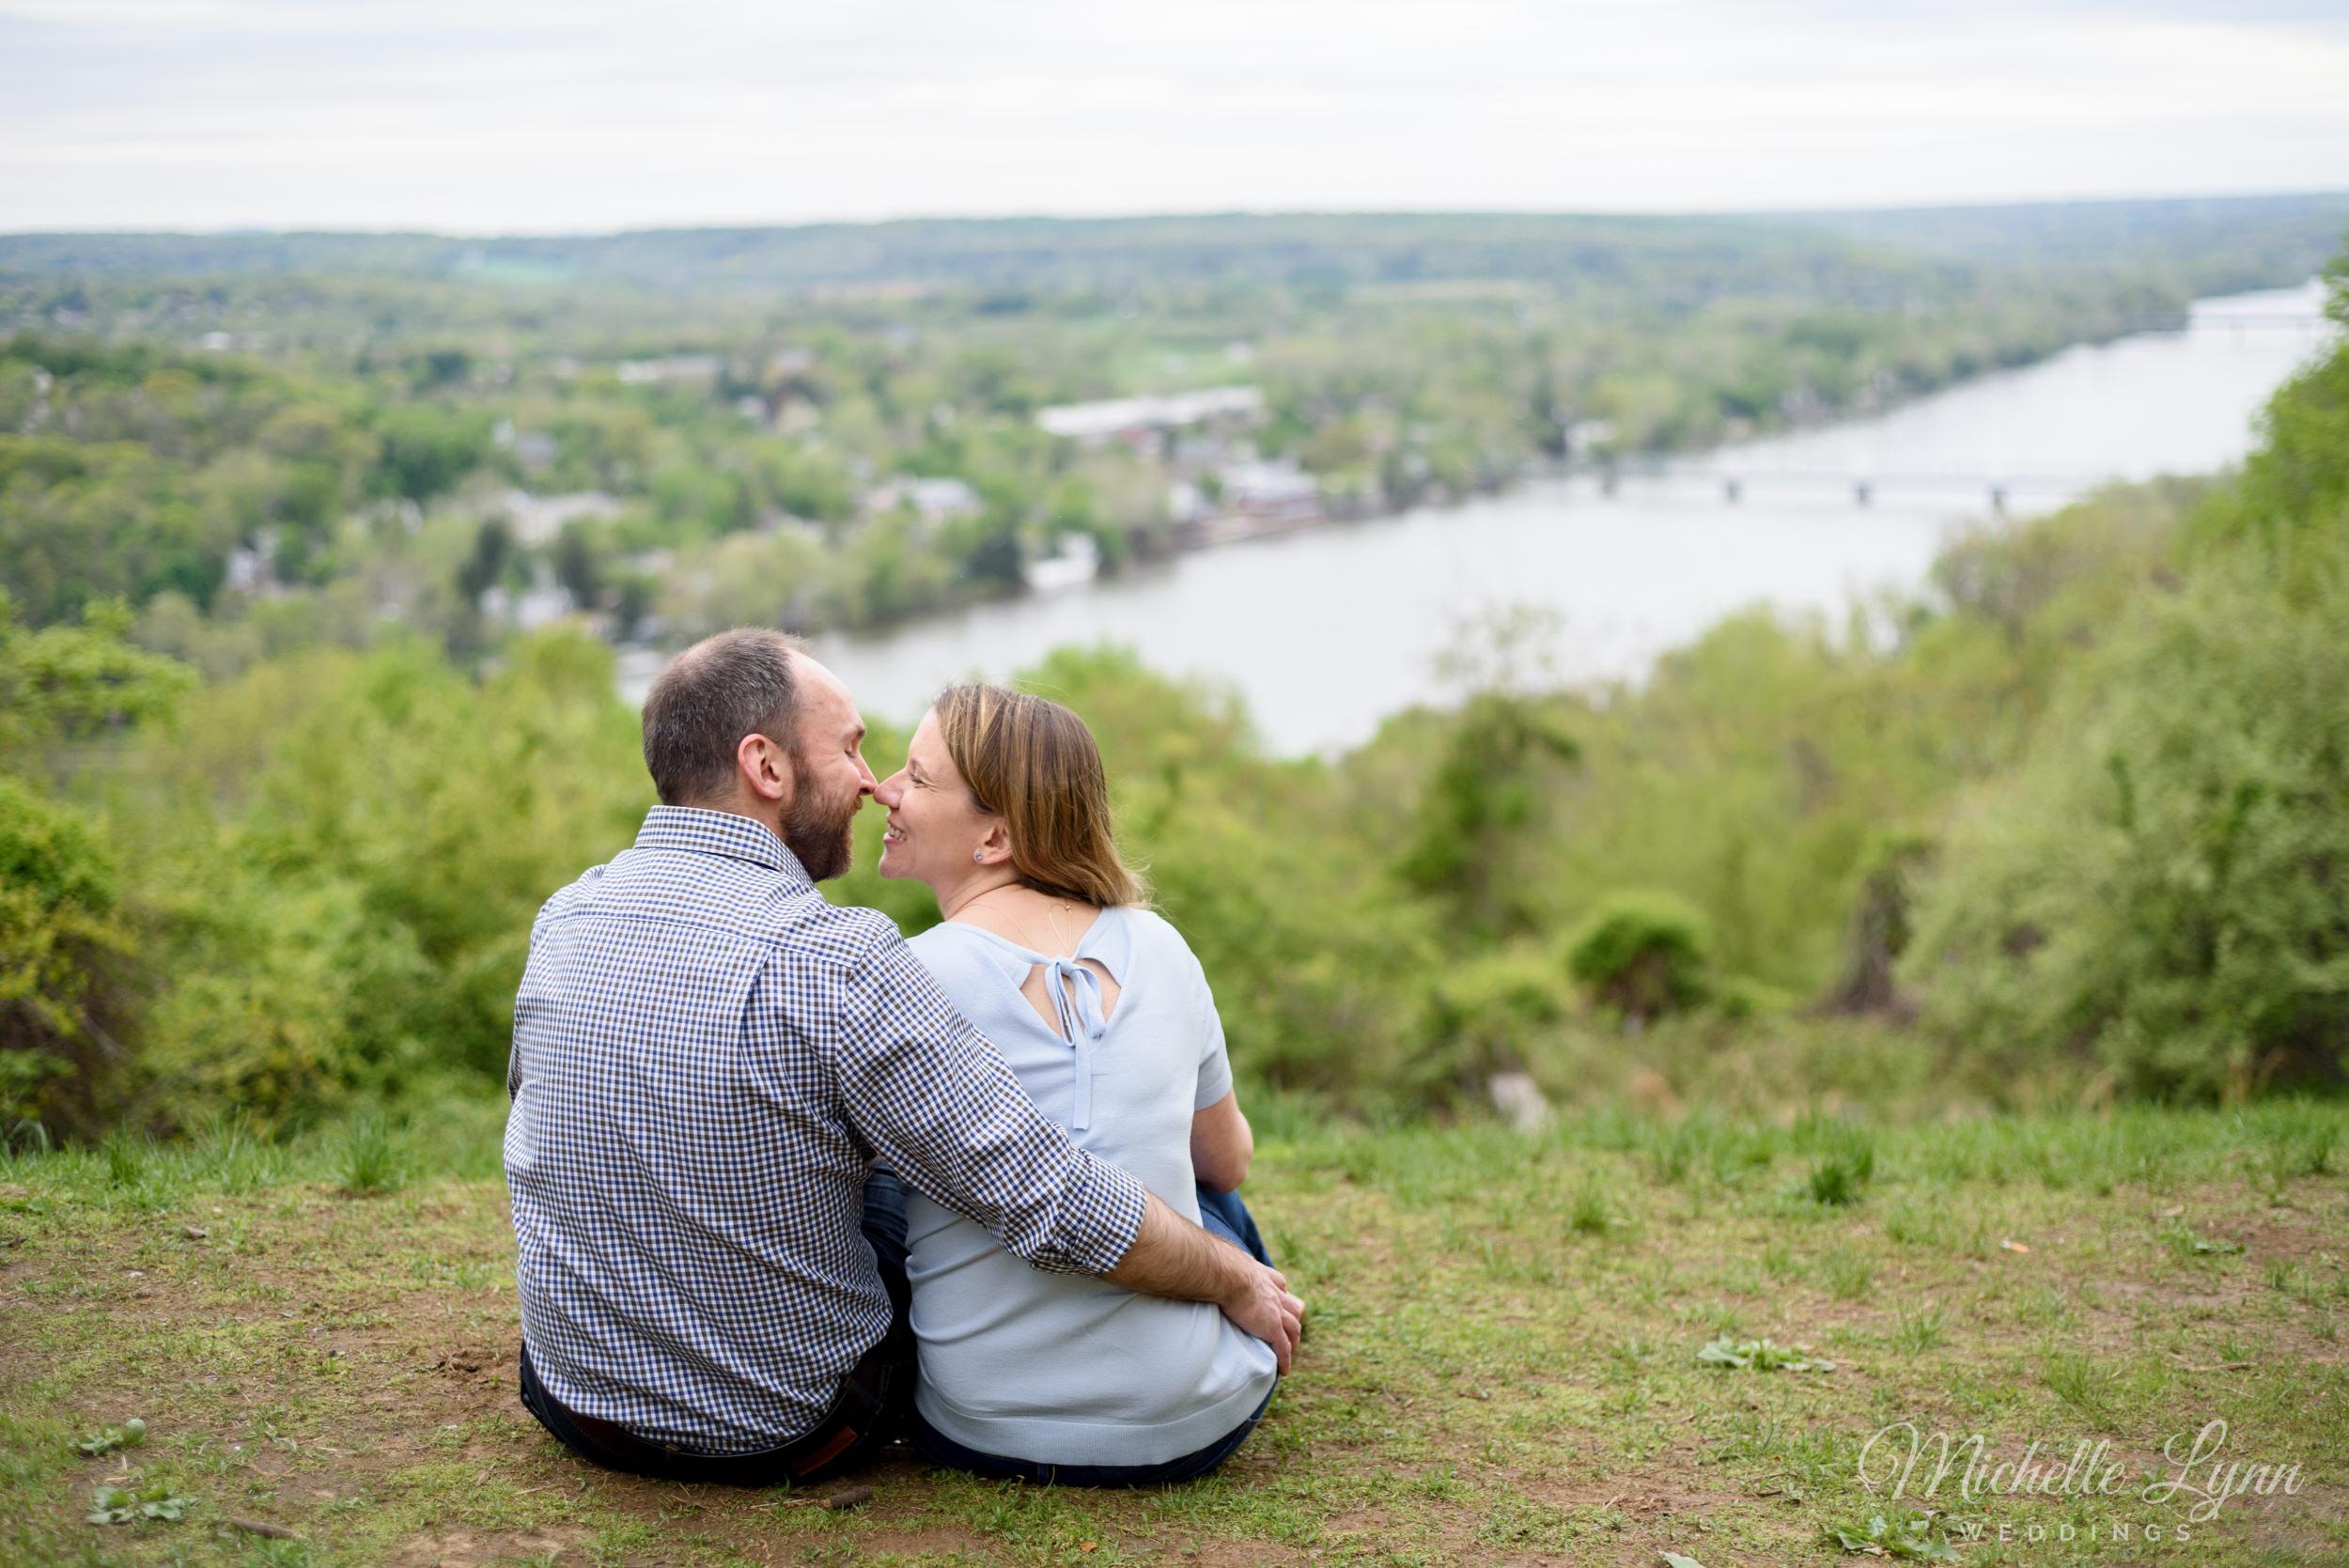 mlw-washingtons-crossing-pennsylvania-engagement-photos-29.jpg